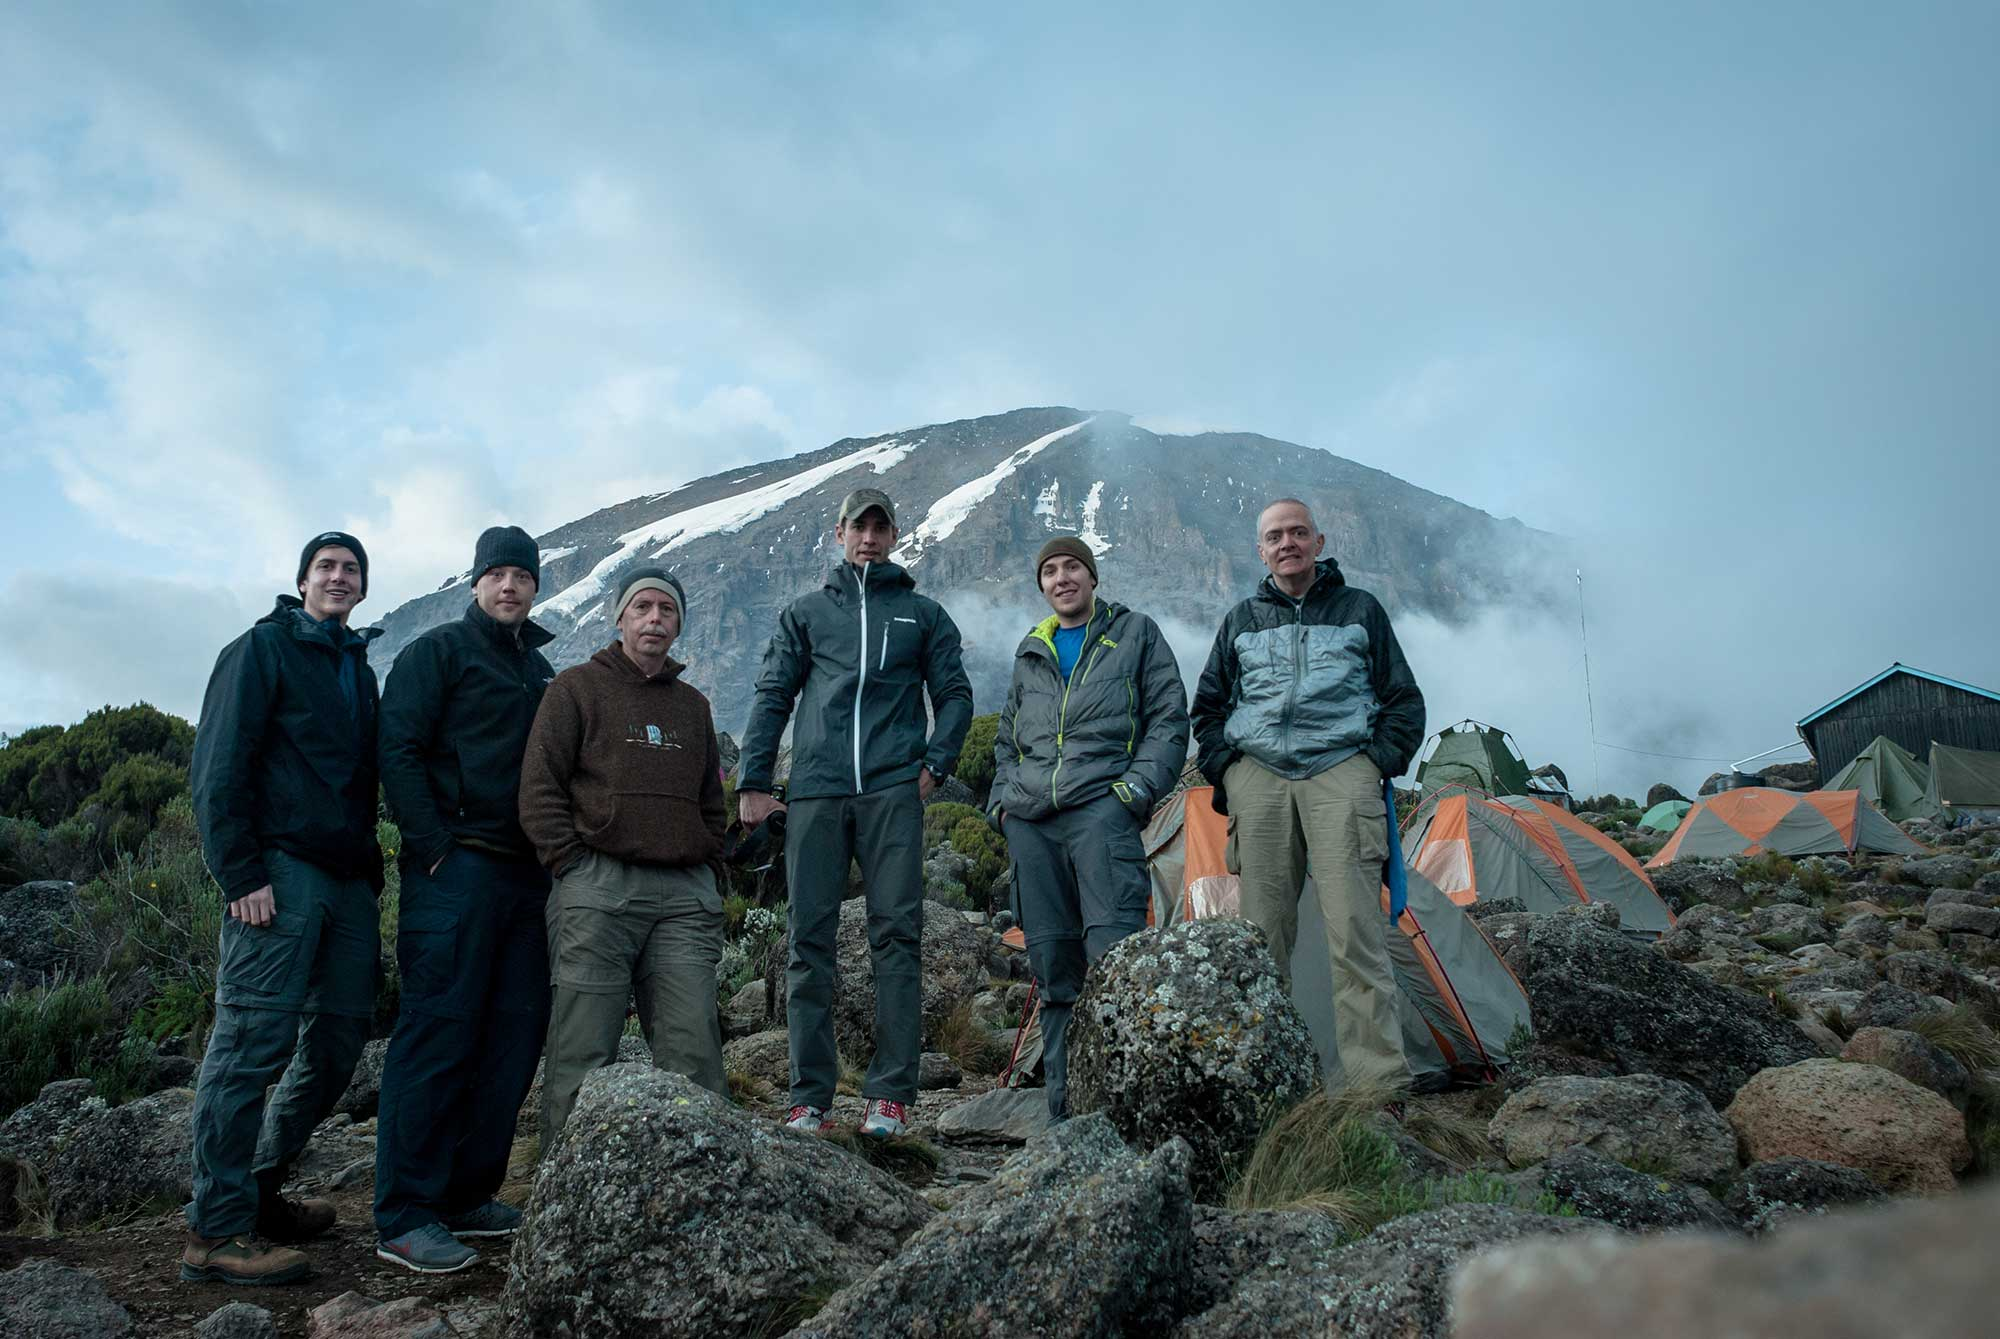 D5-18-all-the-dudes-except-me-karanga-camp-kilimanjaro.jpg